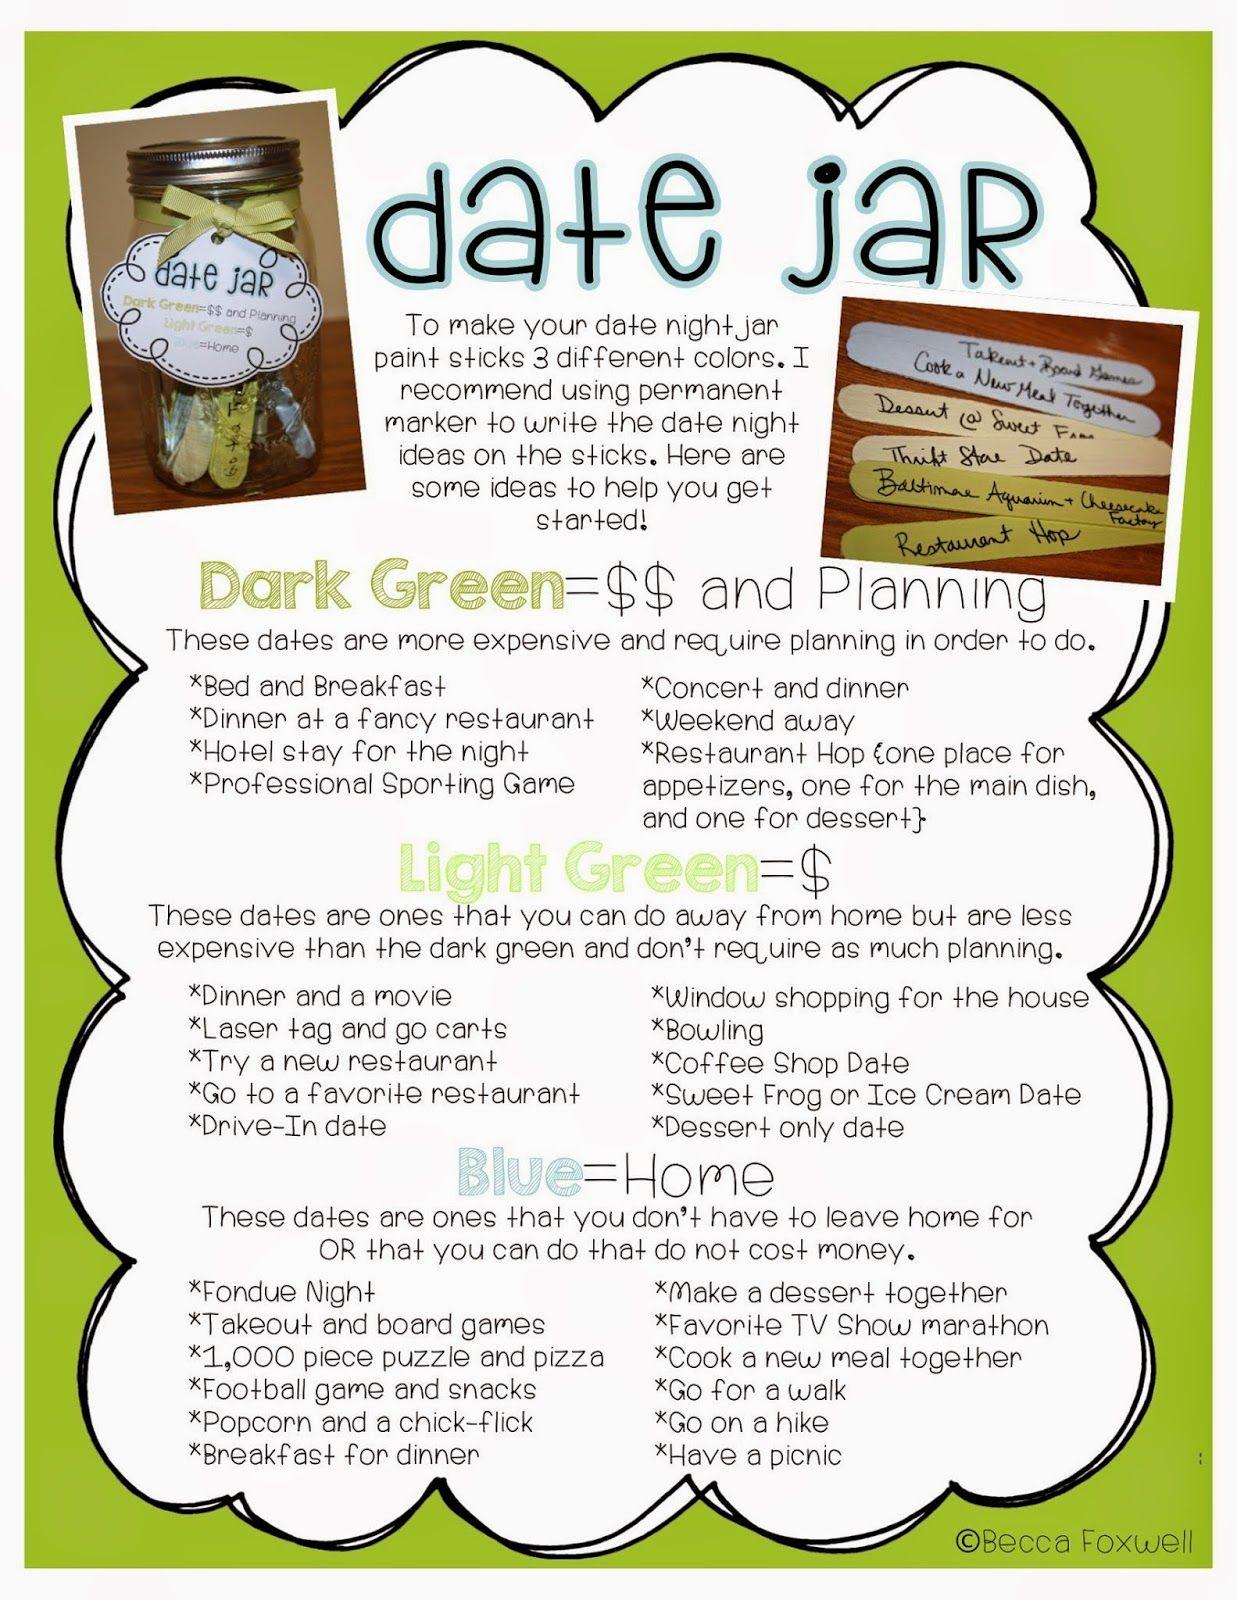 Date Jar Ideas! | Boyfriend! | Pinterest | Jar, Relationships and Gift